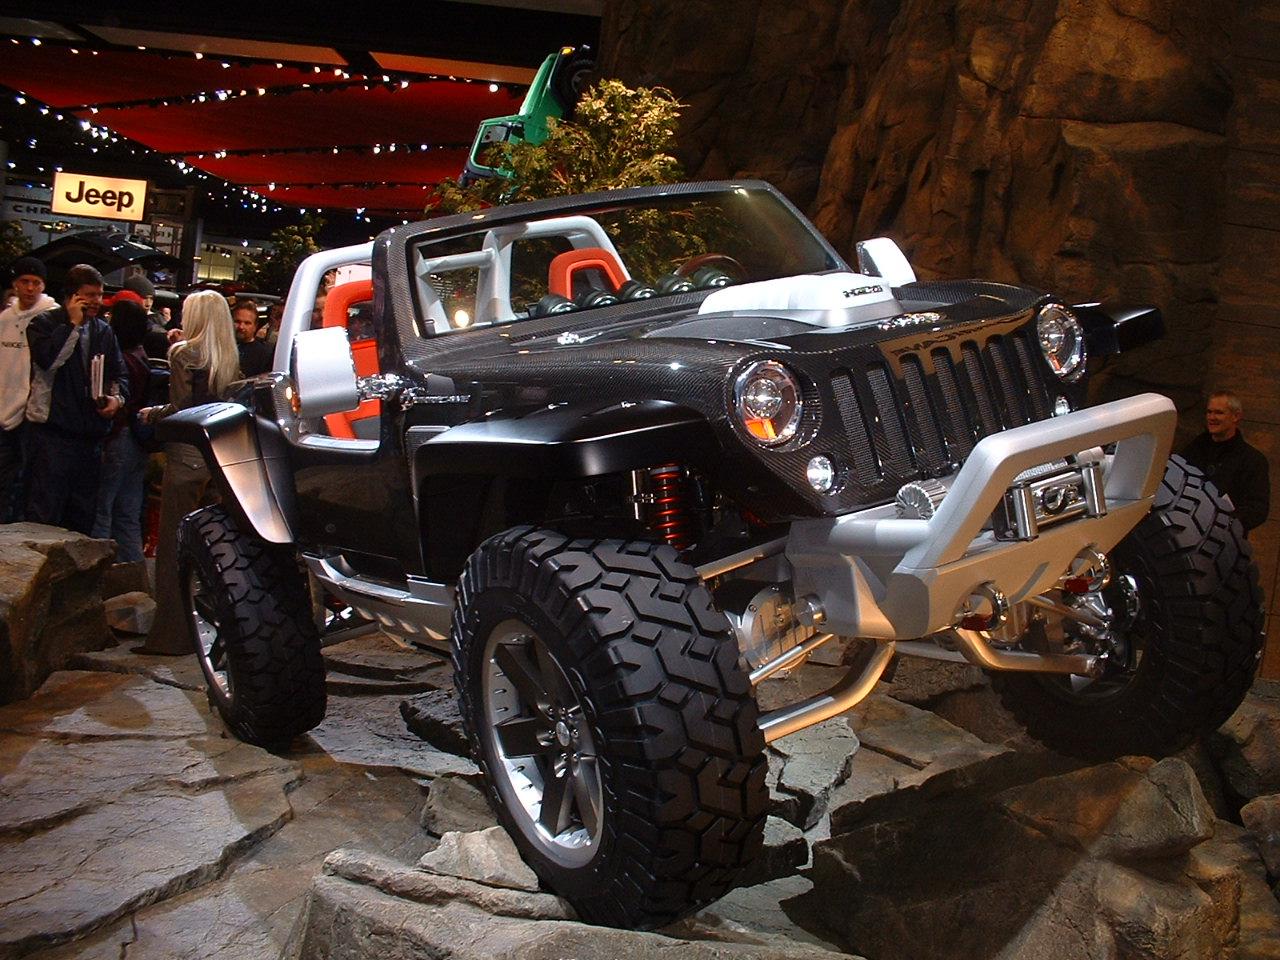 The Jeep Hurricane at the 2005 Jeep Hurricane Engine